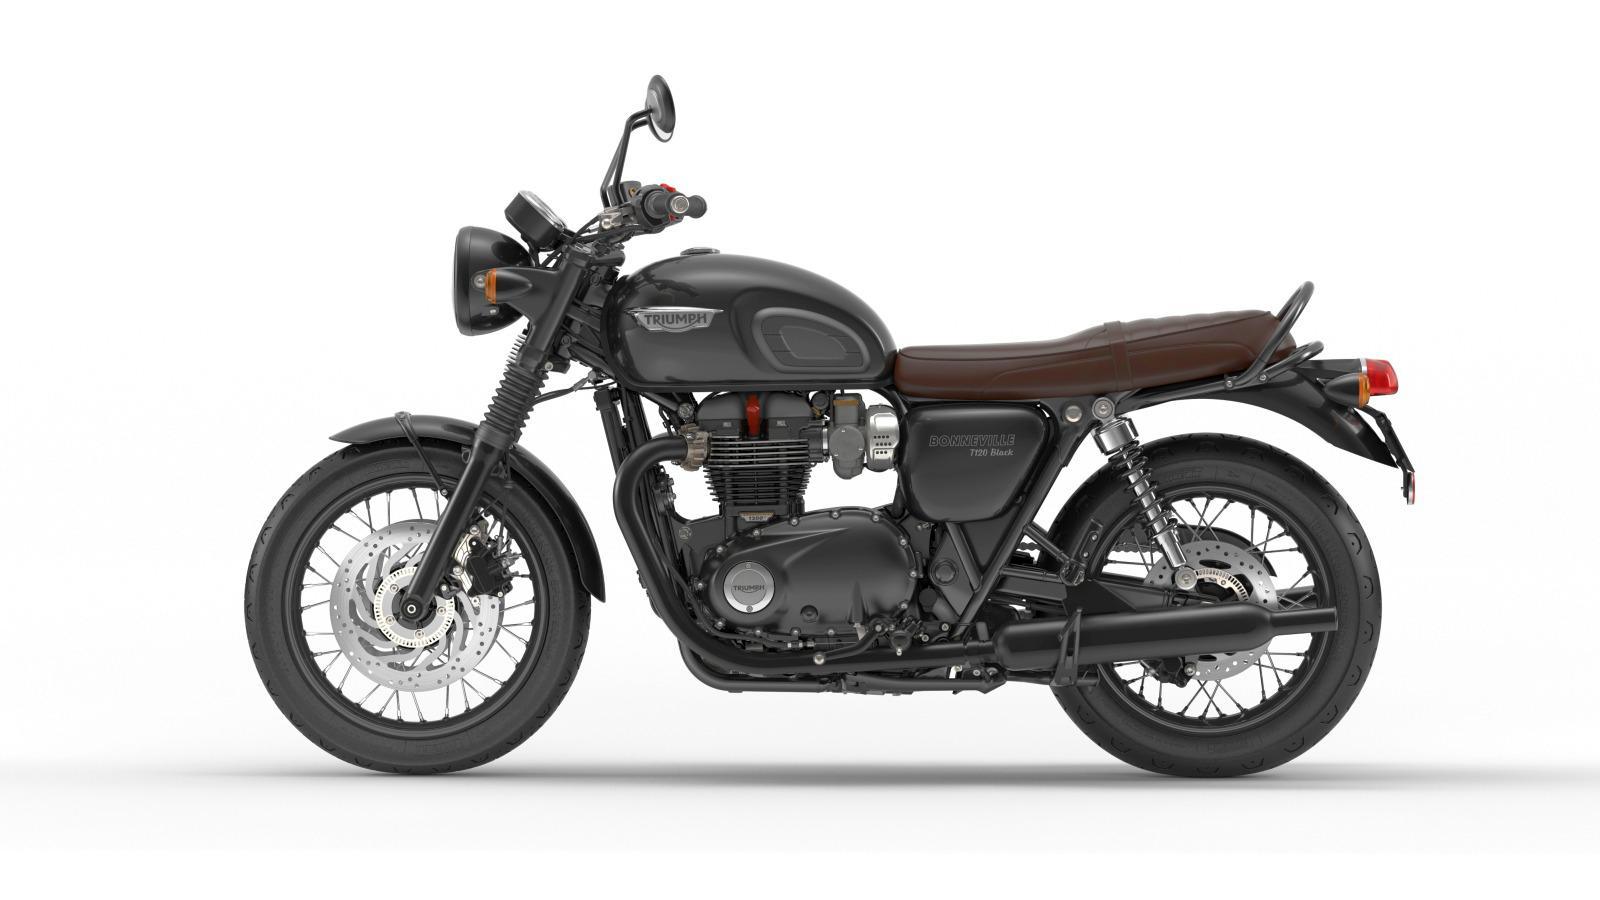 triumph bonneville t120 und t120 black 2016 motorrad fotos. Black Bedroom Furniture Sets. Home Design Ideas